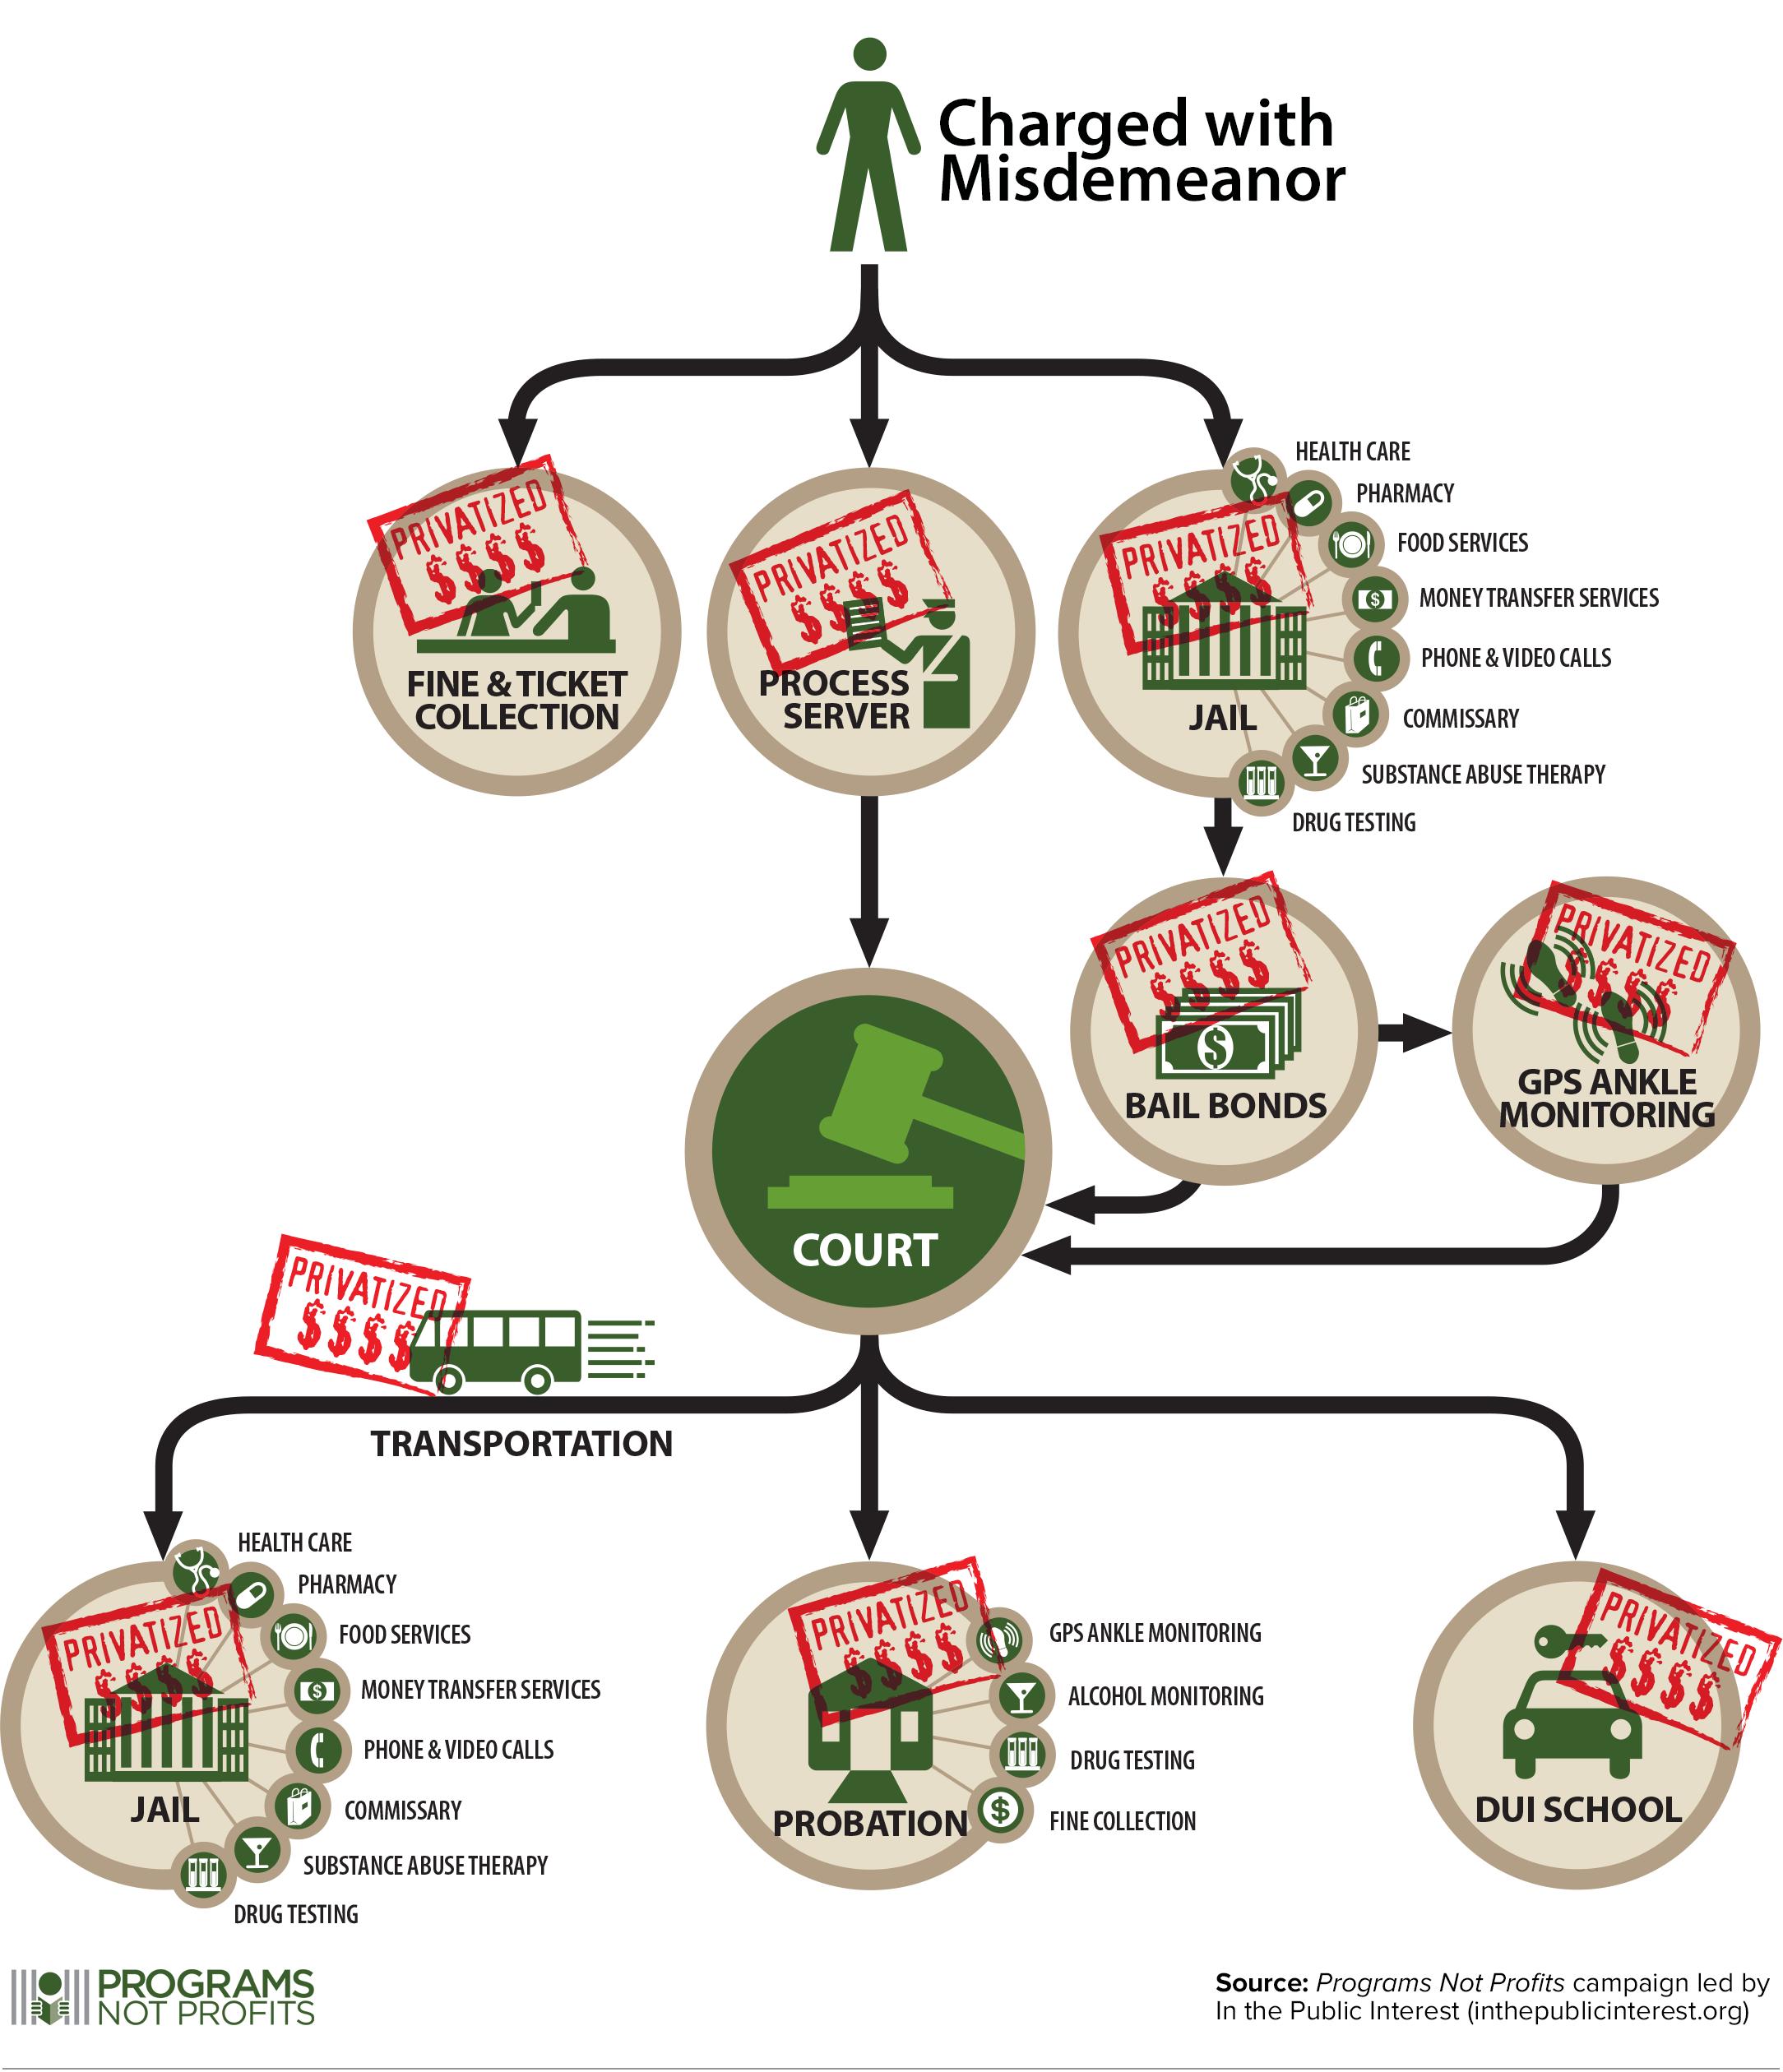 How Do Companies Make Money From Incarceration? - The ...